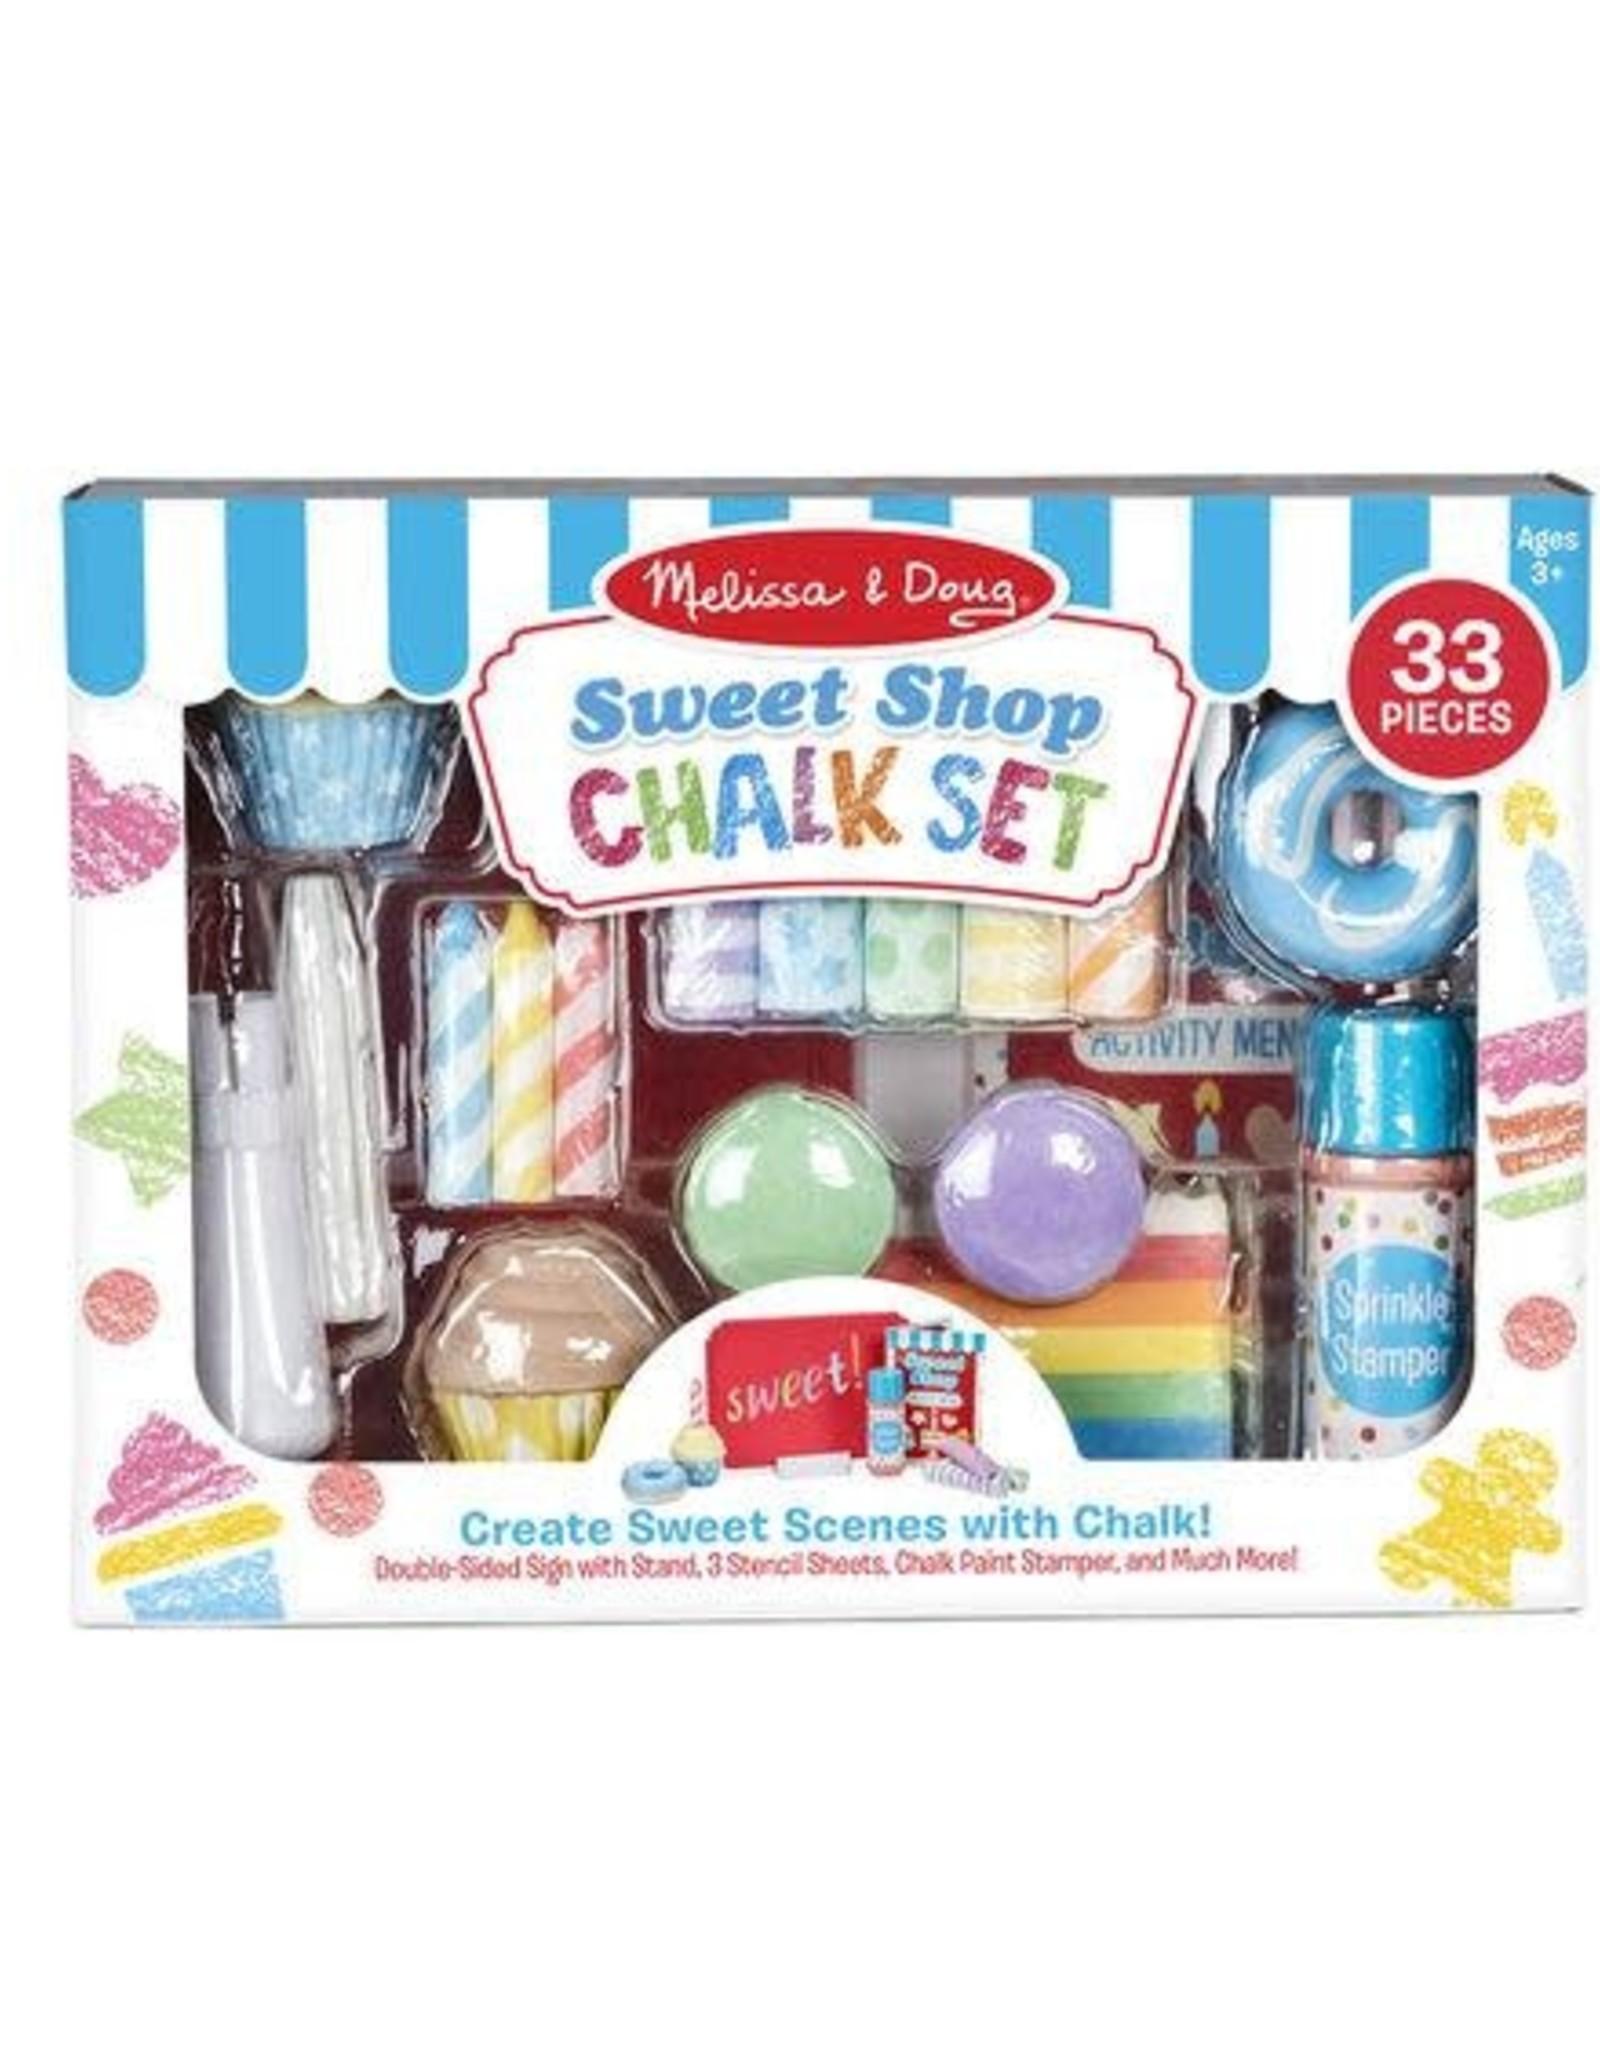 Melissa & Doug MD Chalk Set Sweet Shop